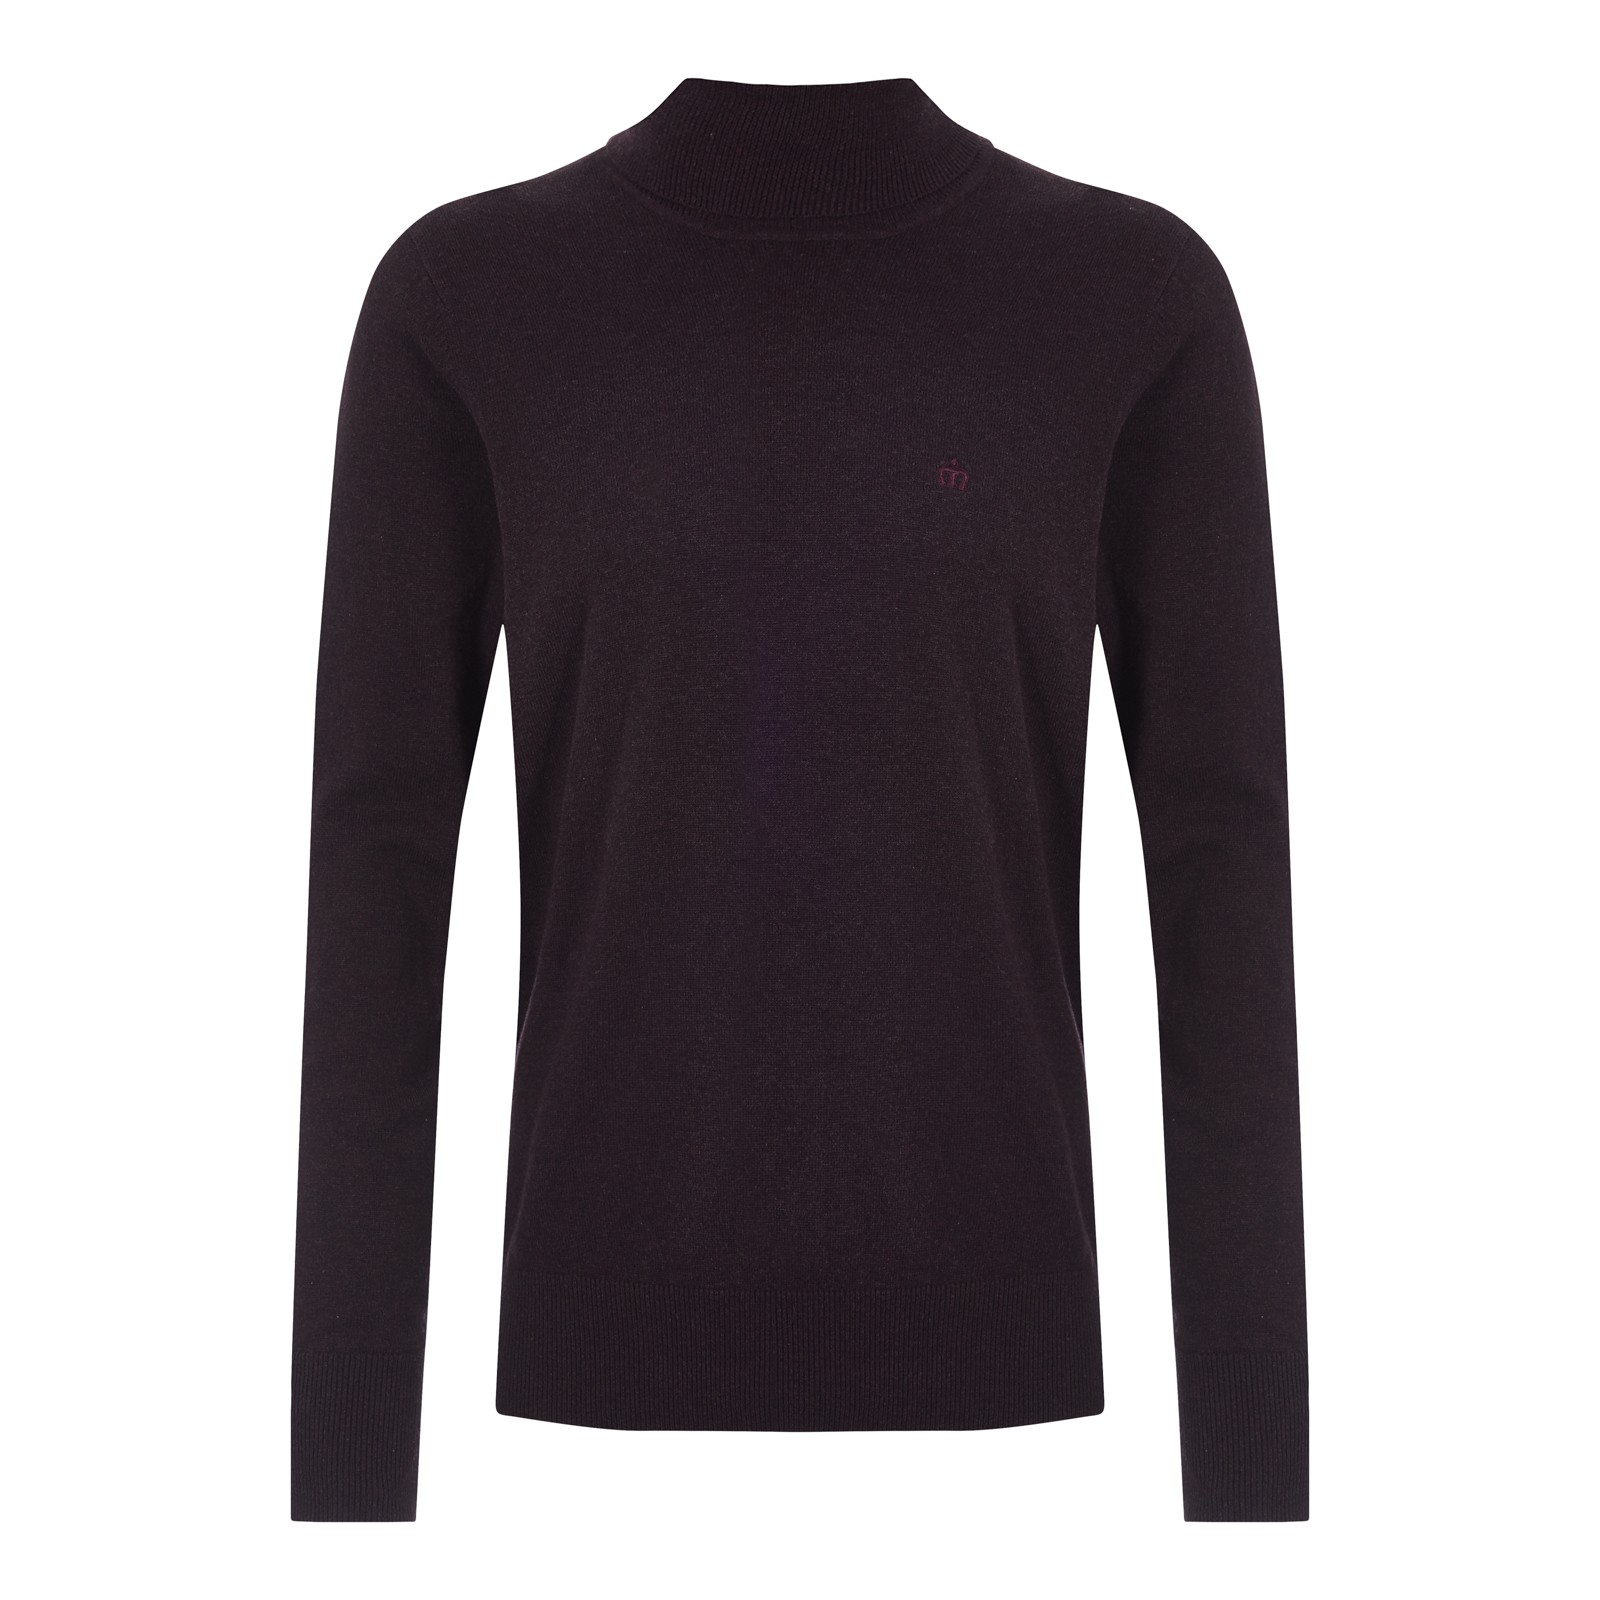 Sweter MERC LONDON HAIG bordowy